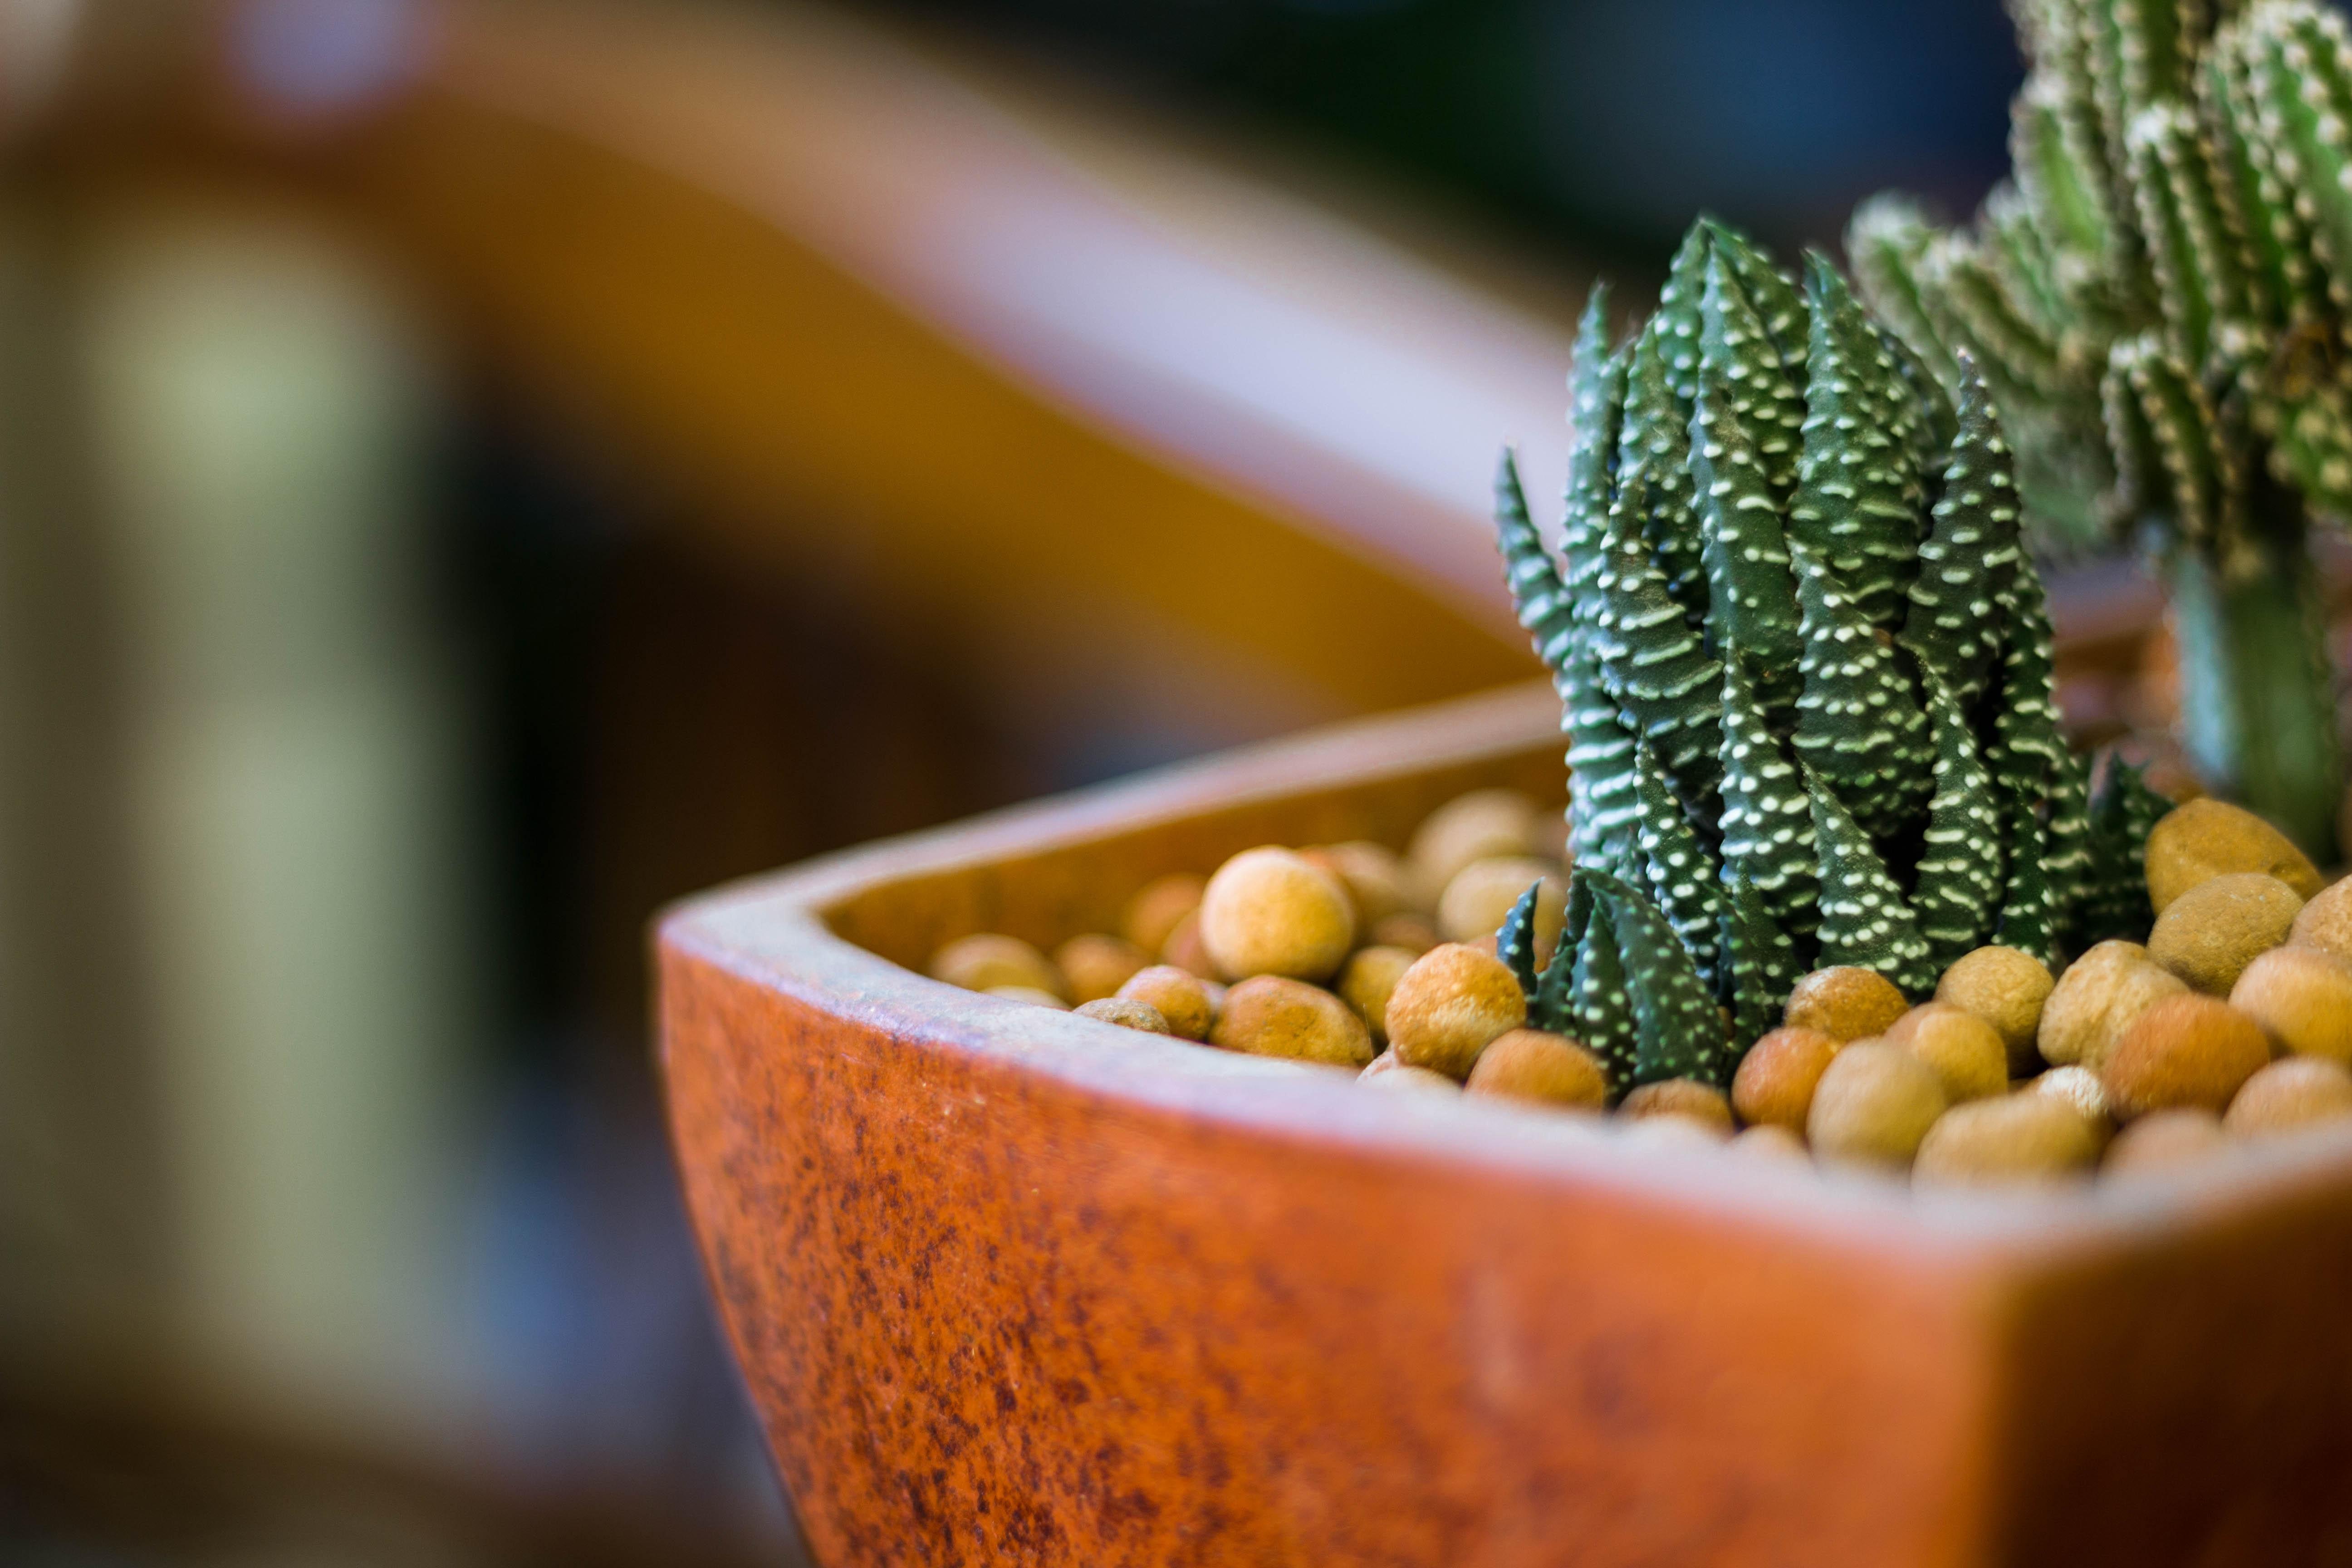 Foto De Stock Gratuita Sobre Cactus Fondos De Pantalla De Alta